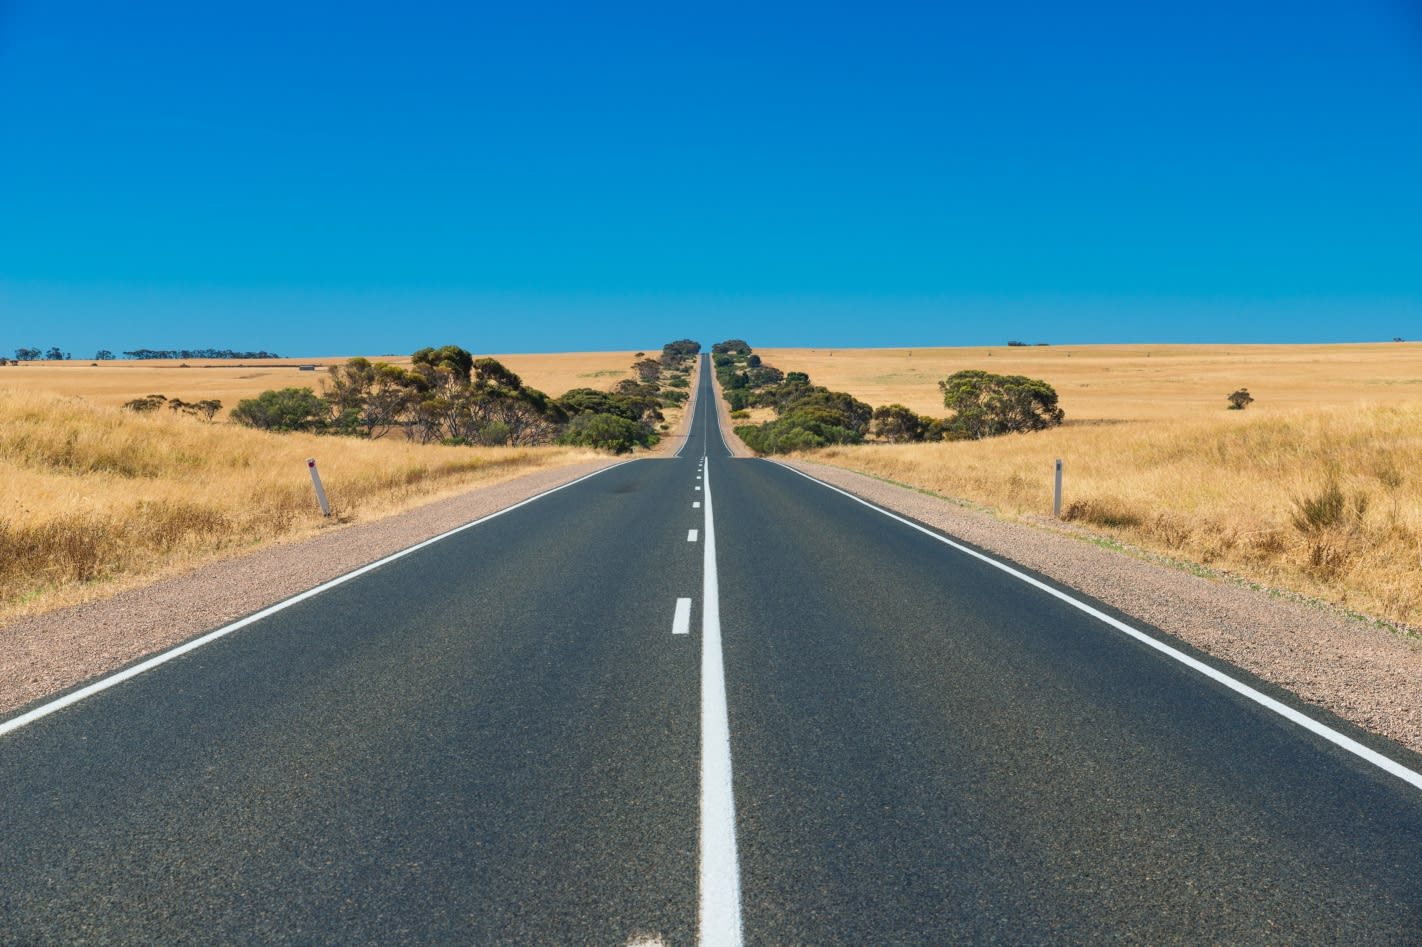 Deserted outback road